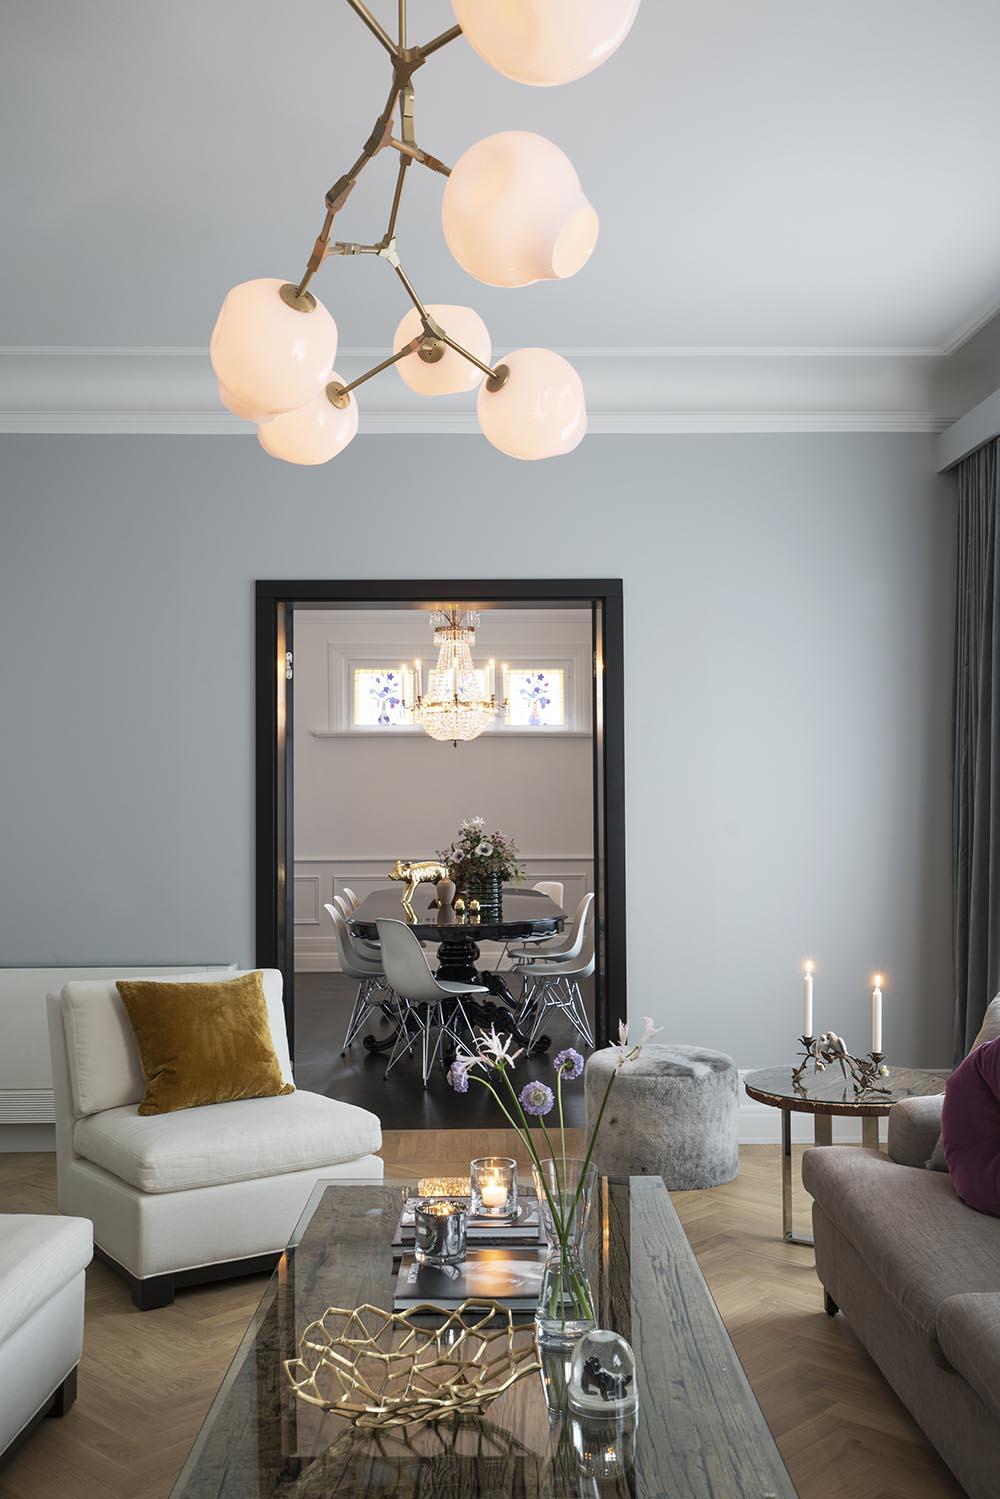 interiør, interiørarkitektur, stue, inspirasjon